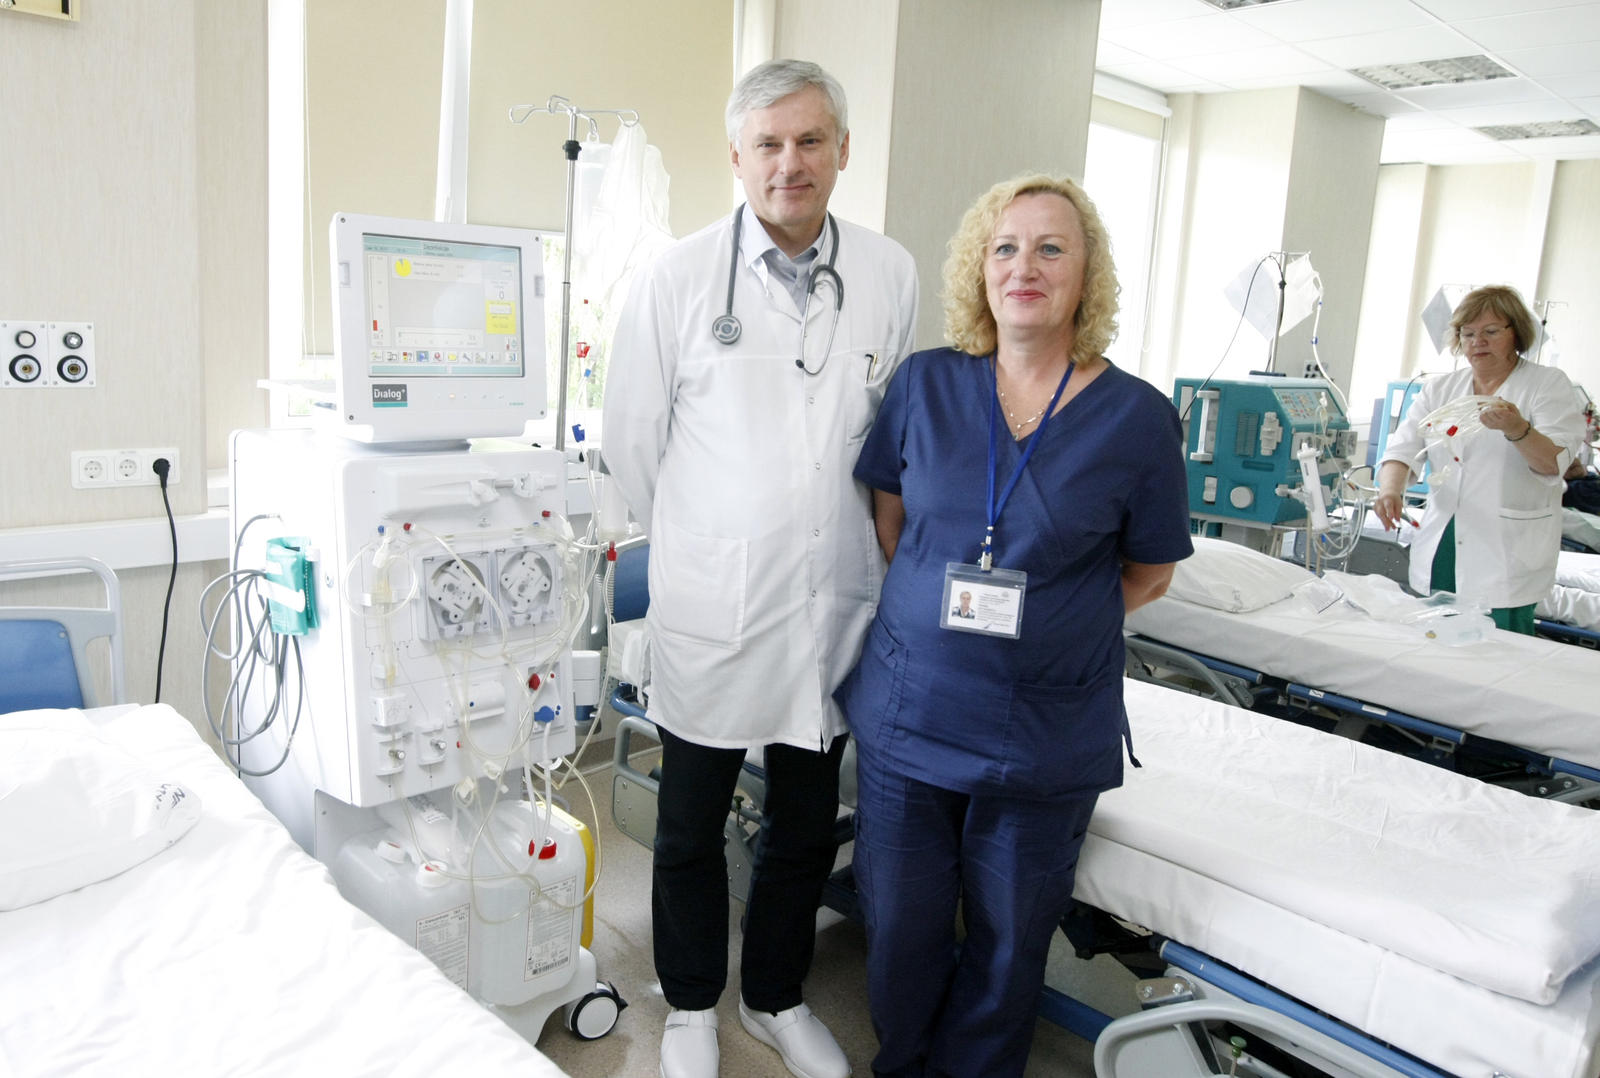 kiek dienų ligoninėje serga hipertenzija